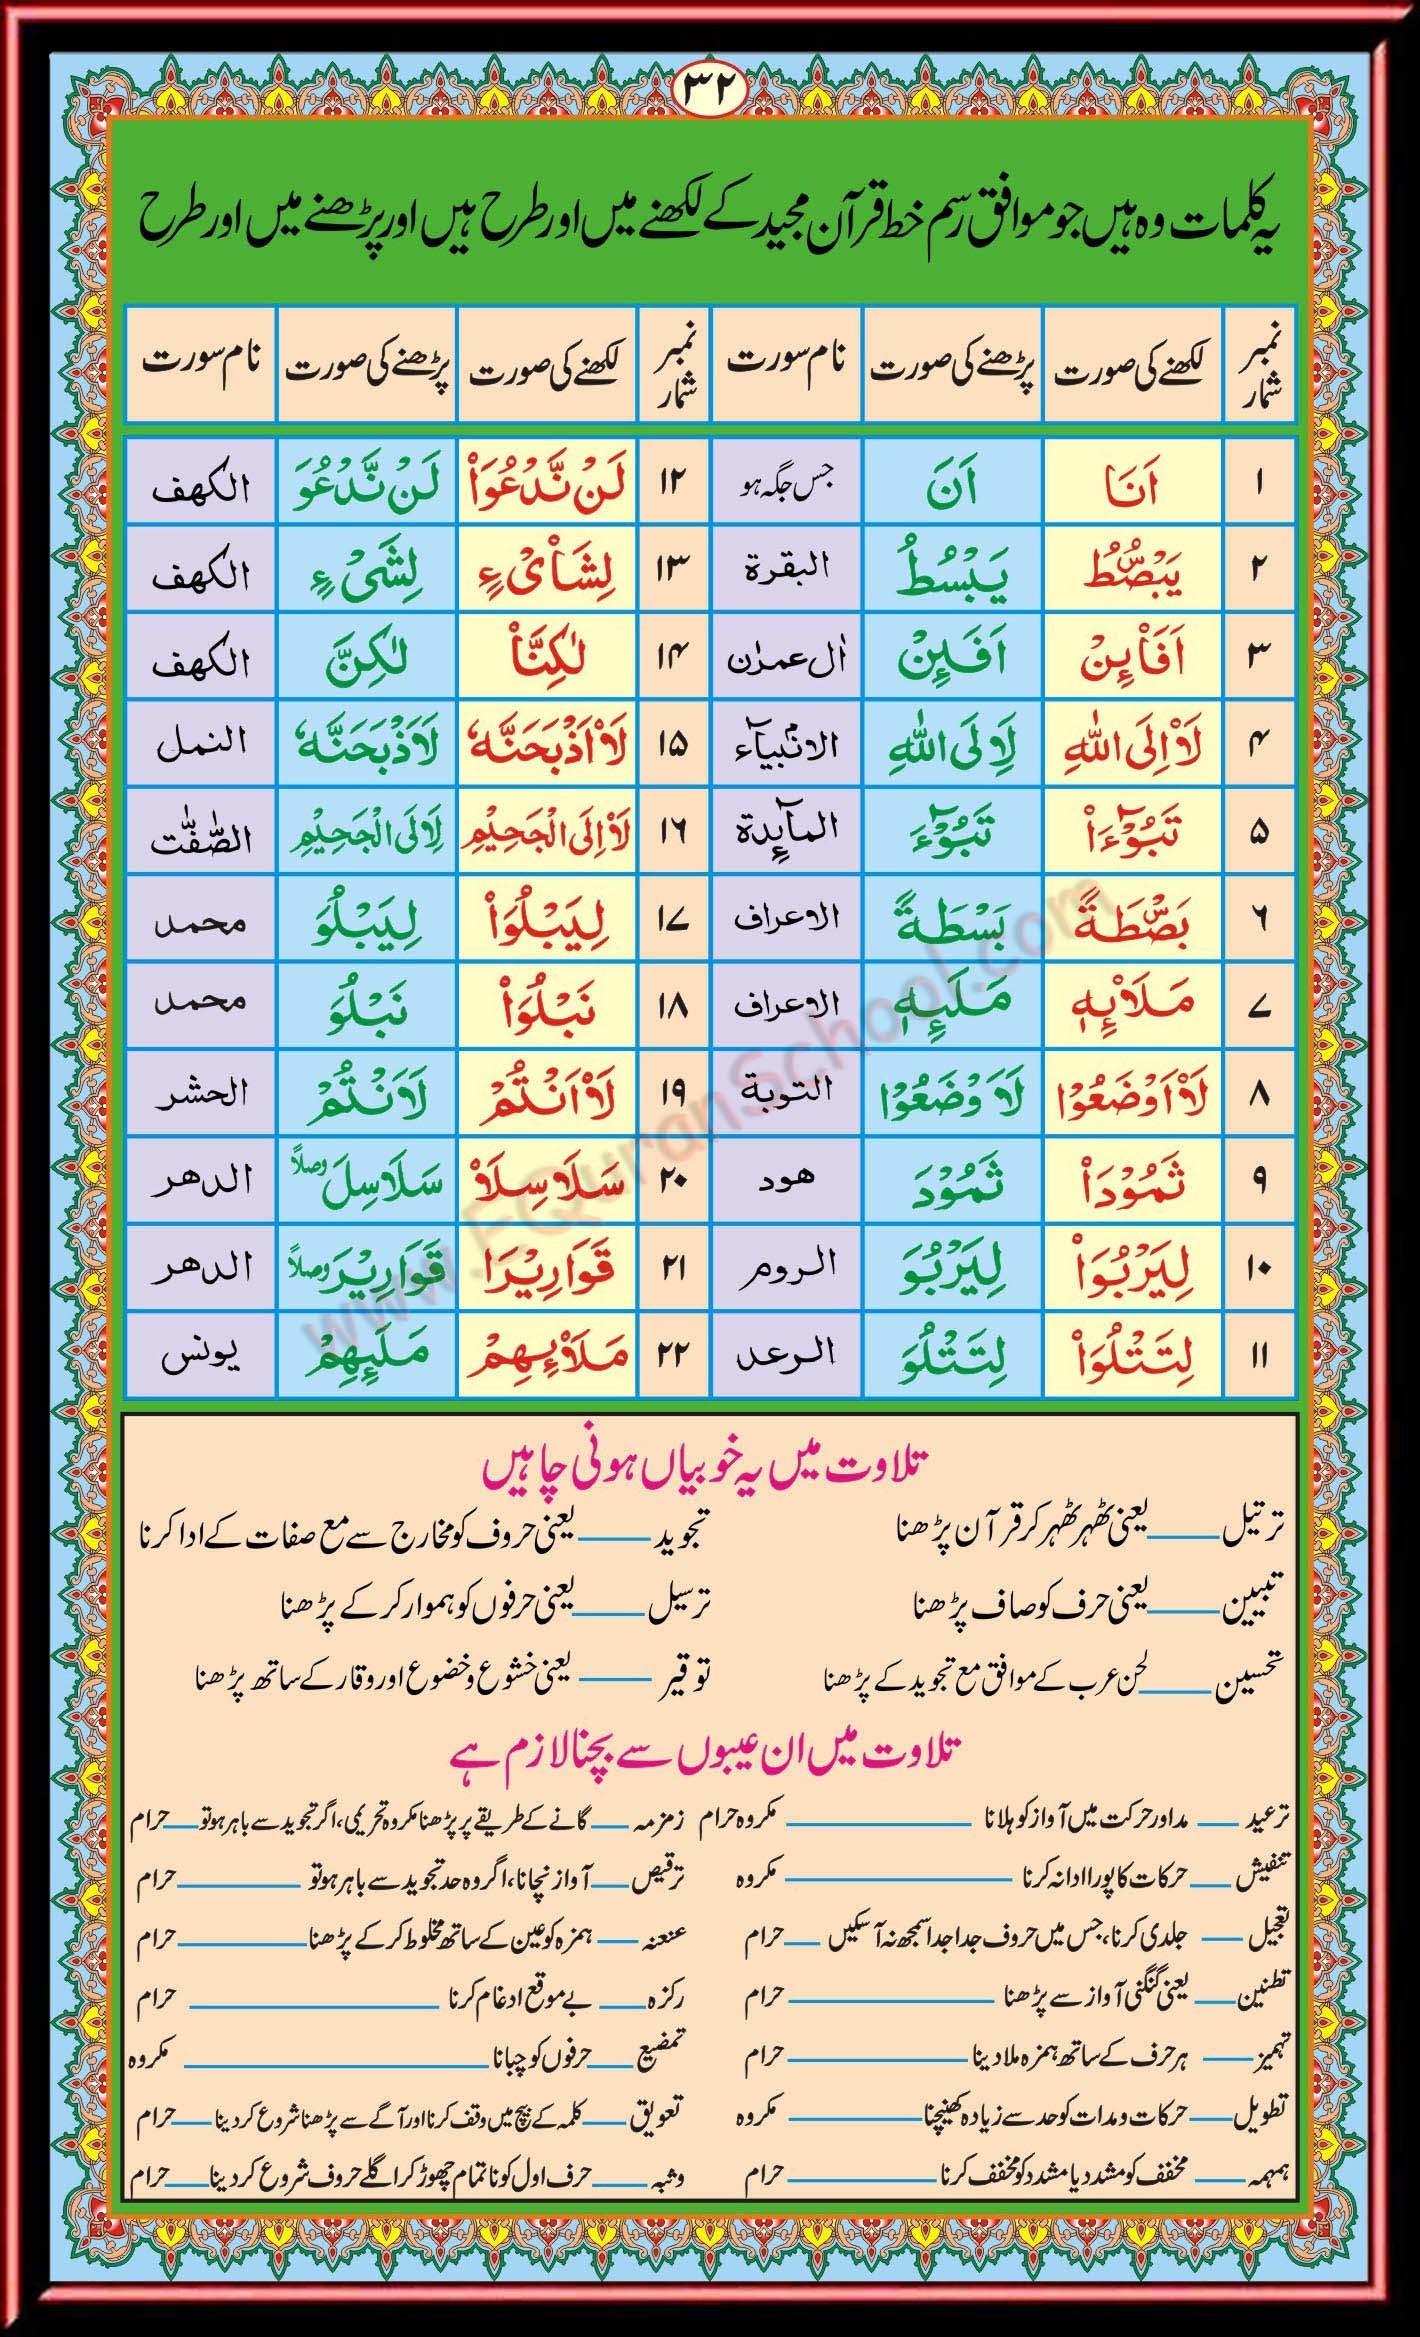 Read Noorani Qaida Online FREE - Online Quran Tutors